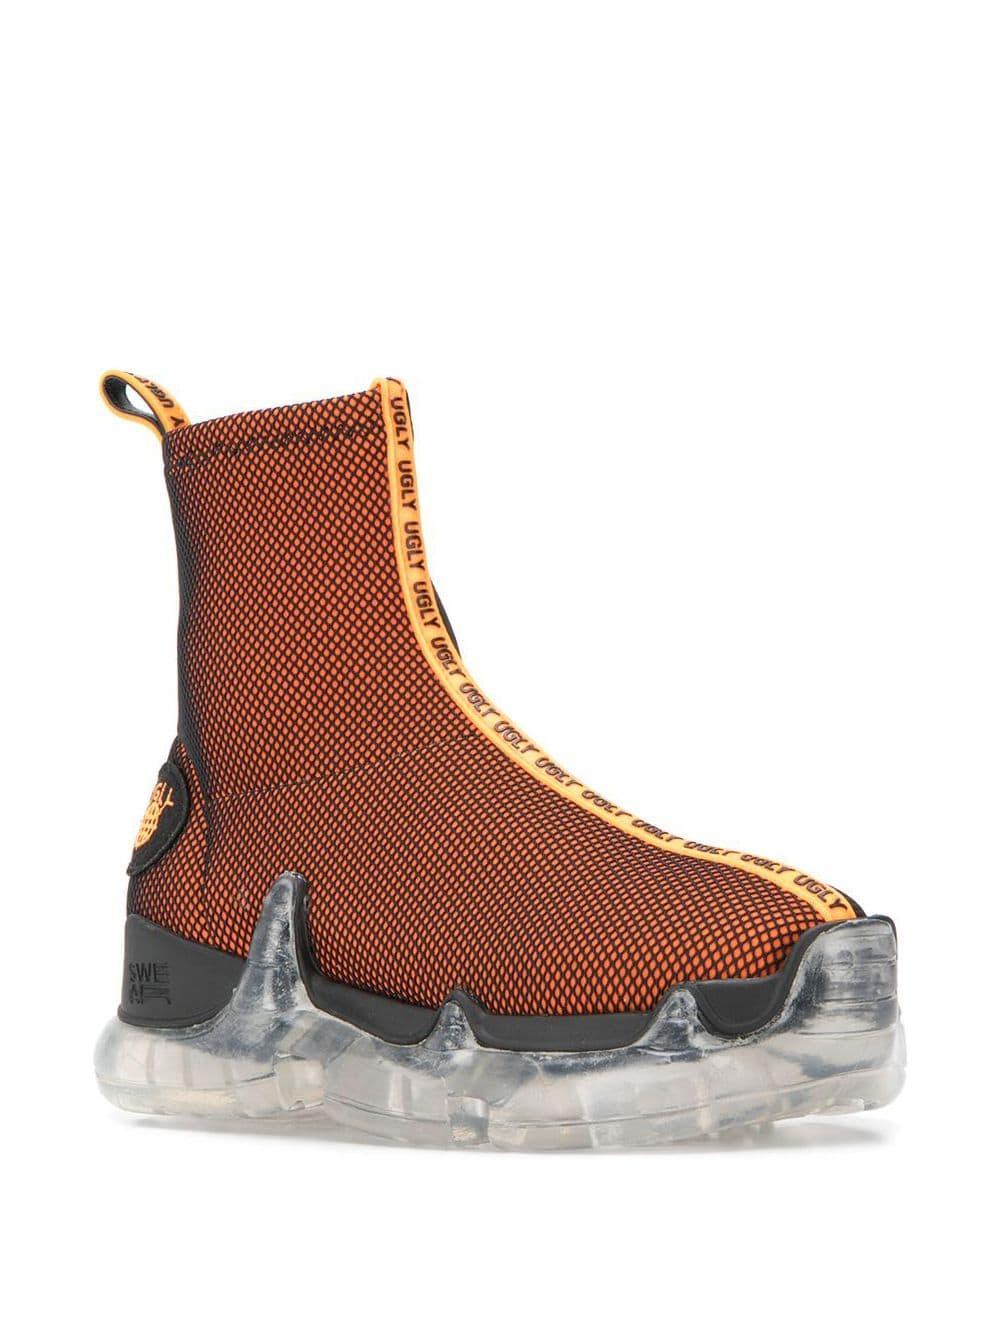 Zapatillas Air Revive Trigger altas de x Uglyworldwide Swear de color Naranja